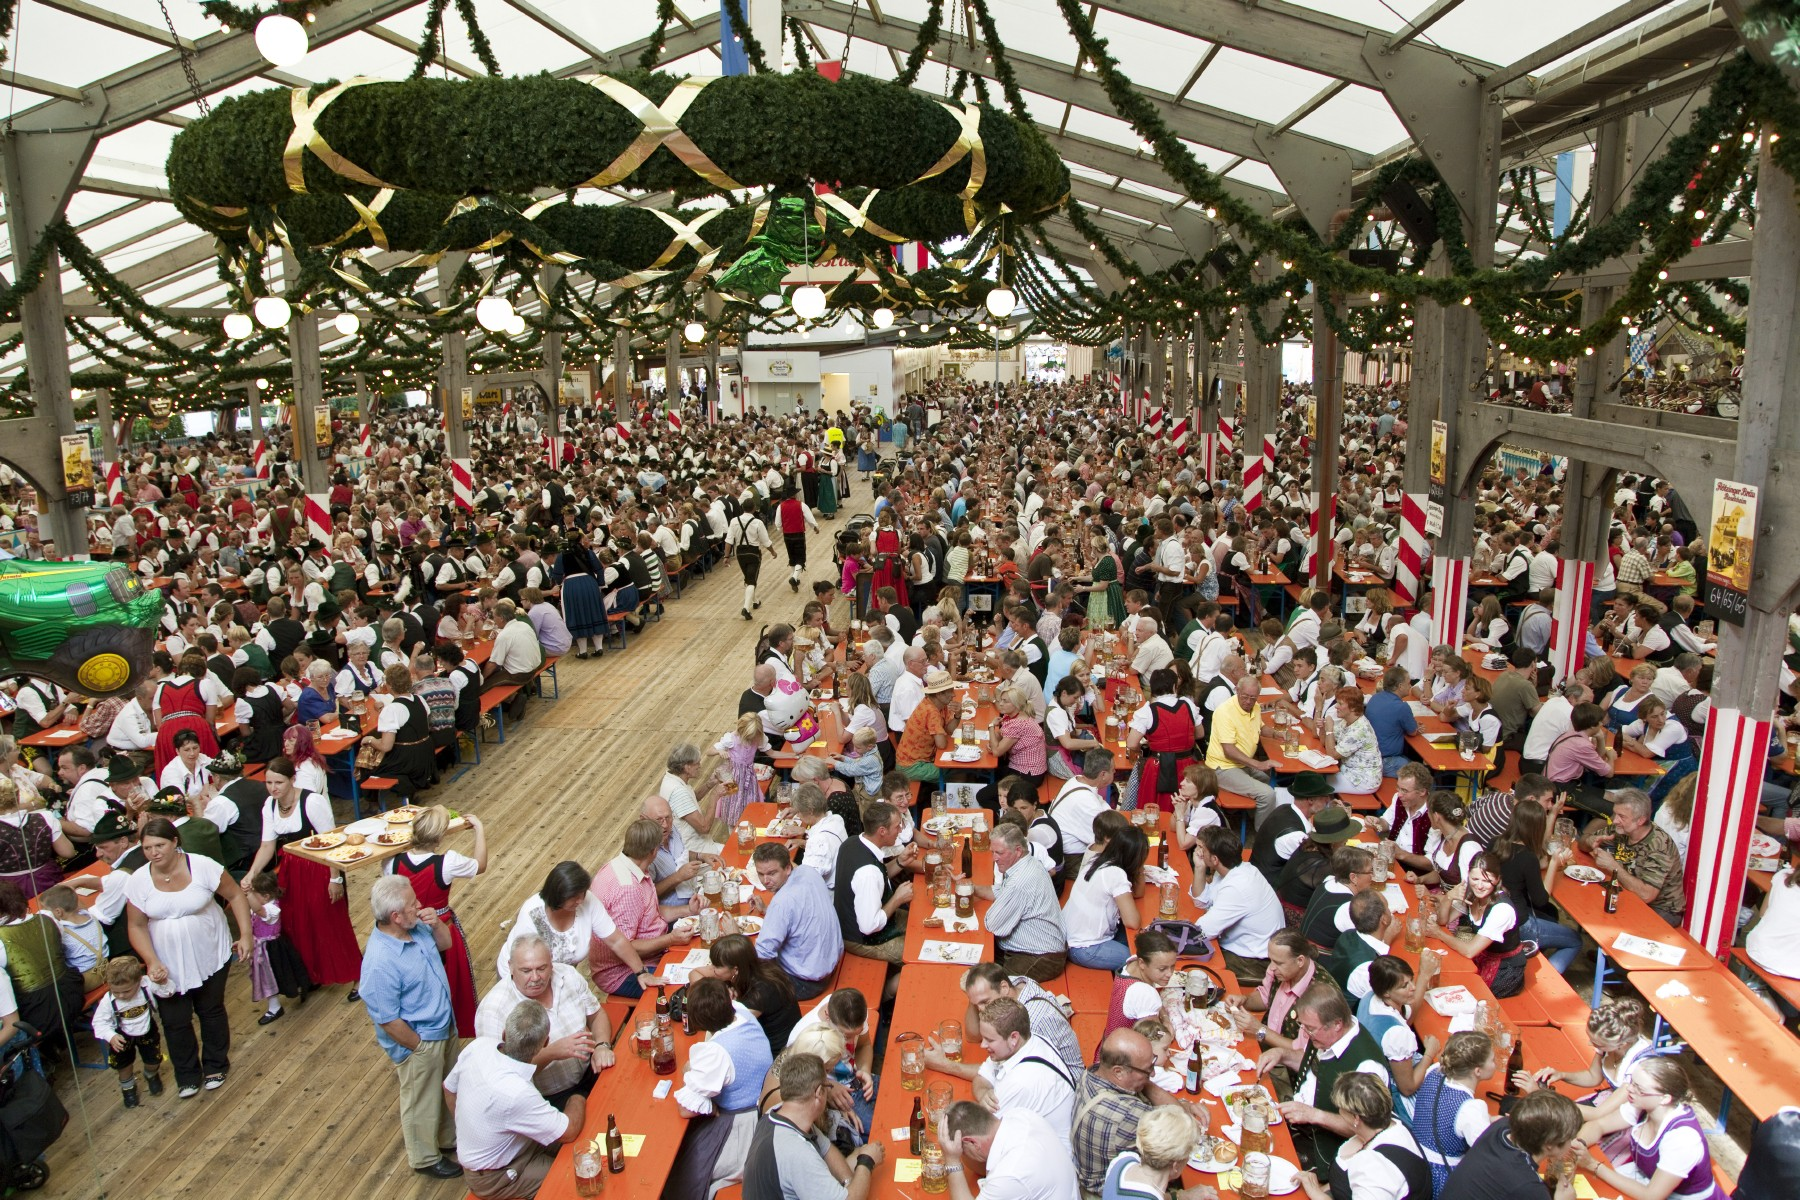 herbstfest-rosenheim-bierzelt.jpg